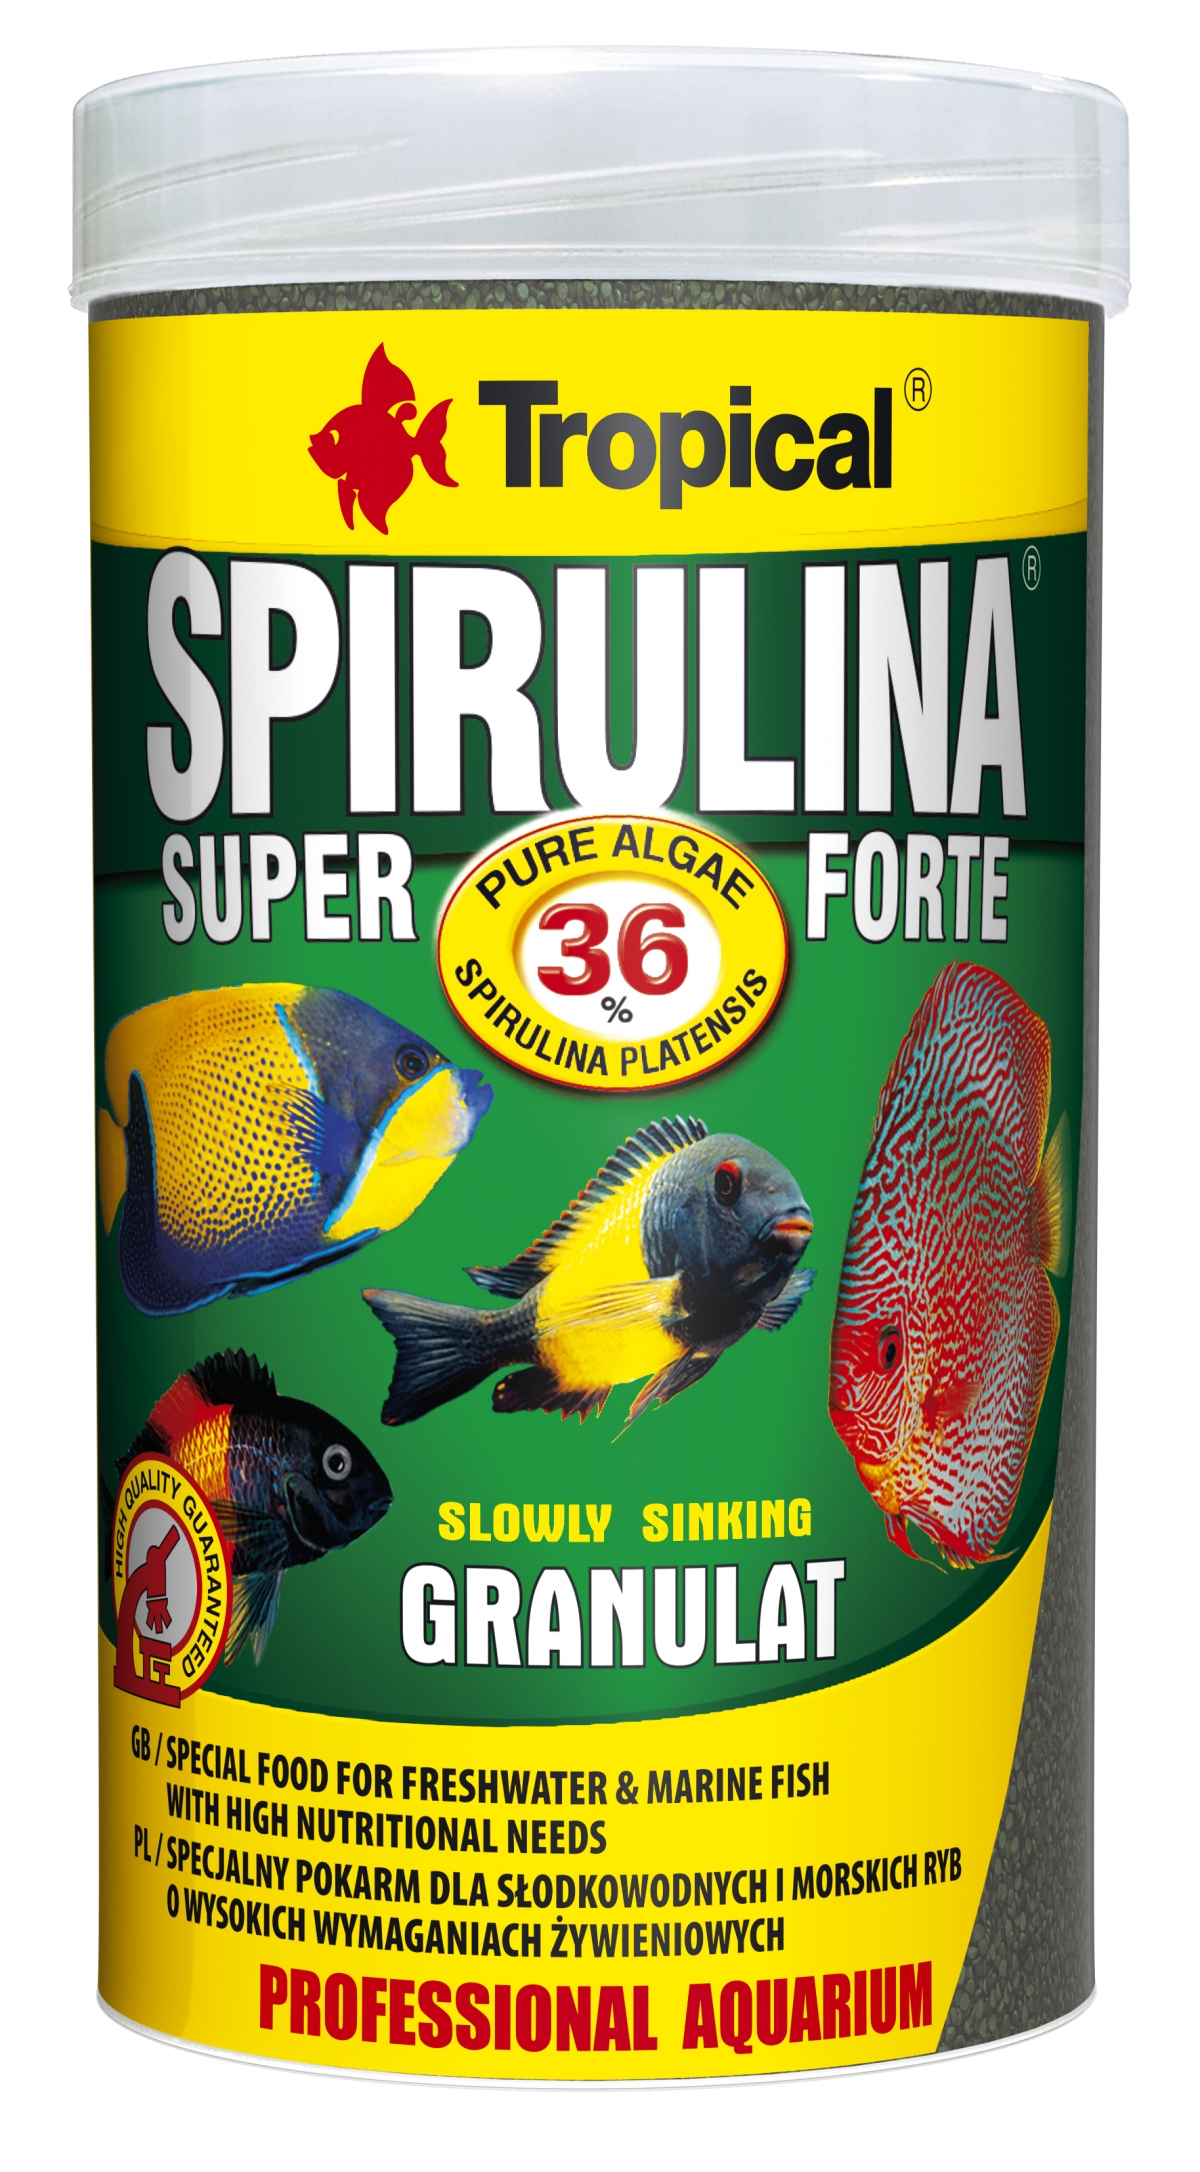 Tropical Super Spirulina Forte Granulát 36% - 100ml /60g